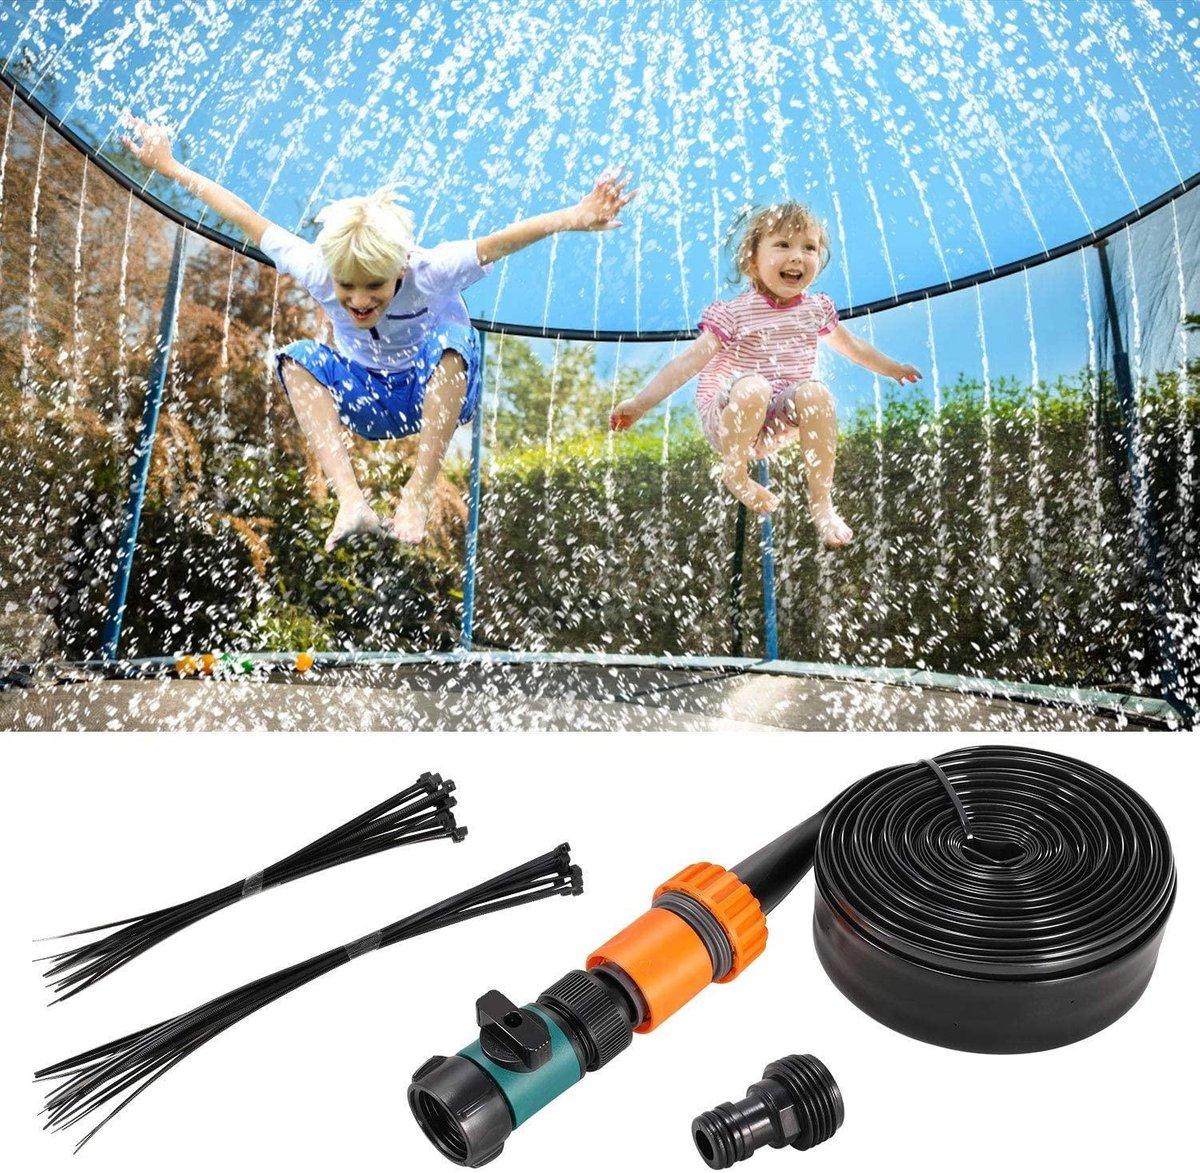 Trampoline sproeier, trampoline sproeier watersproeier trampoline accessoires leuke zomer outdoor waterpark spel voor kinderen (12 m)